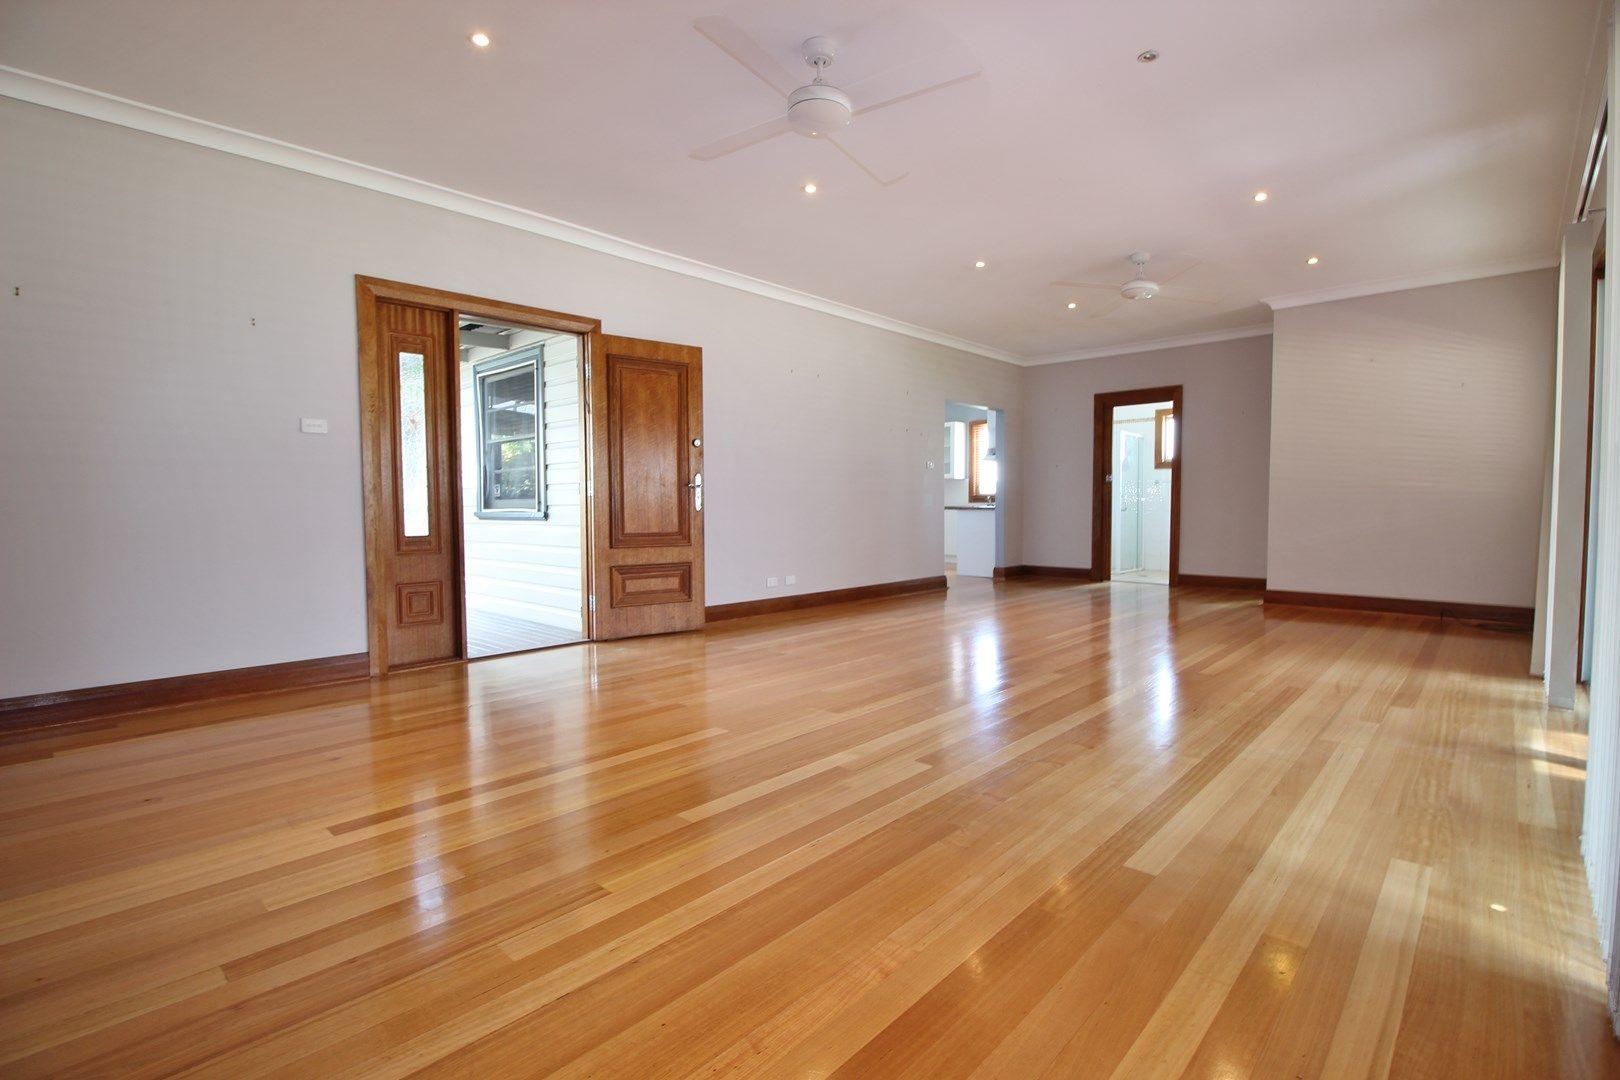 33 Kangaroo Street, Raymond Terrace NSW 2324, Image 0